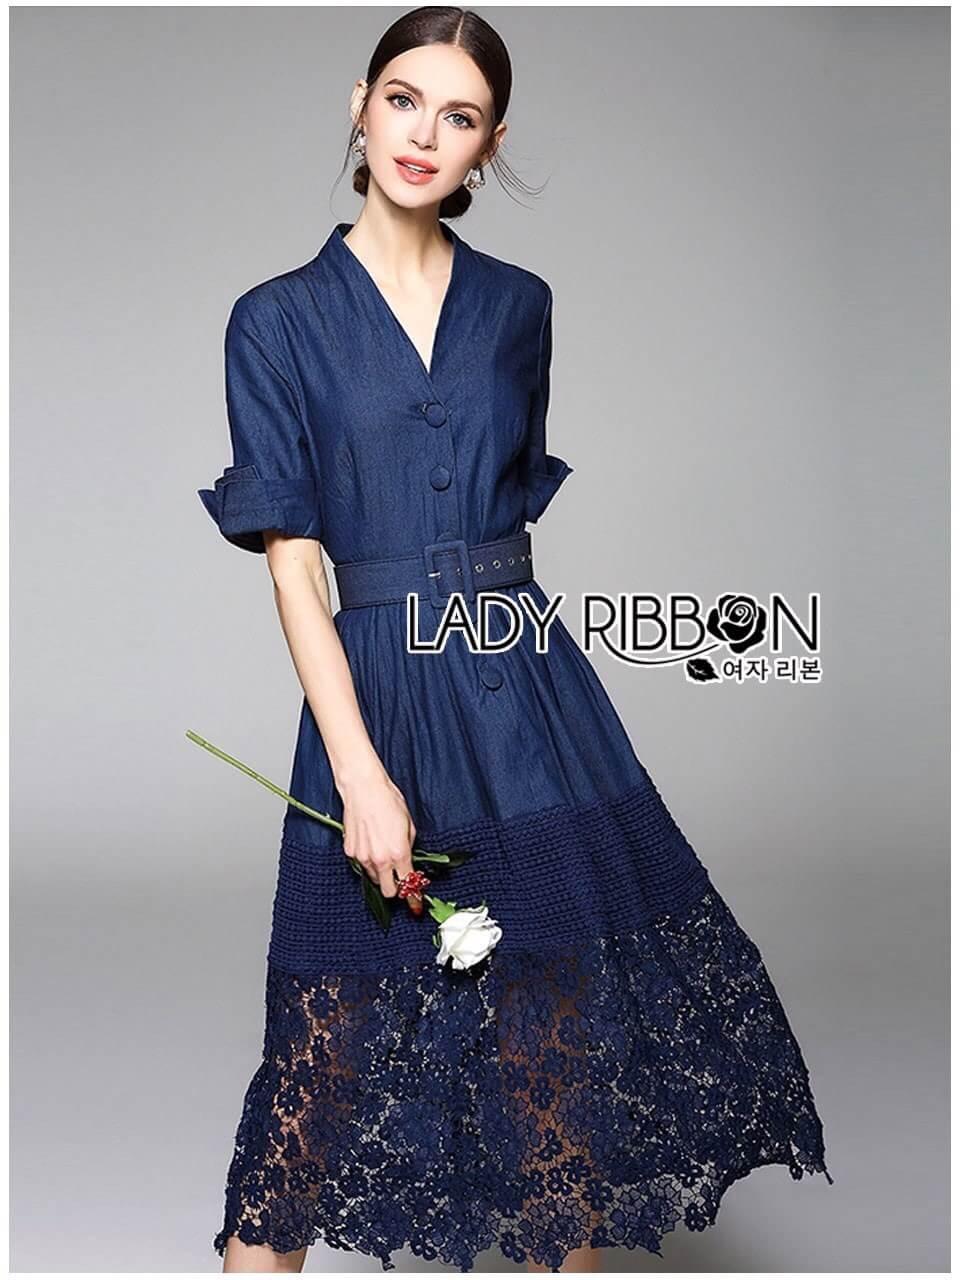 &#x1F380 Lady Ribbon's Made &#x1F380 Lady Elsa Dark Navy Blue jean and Lace Shirt Dress